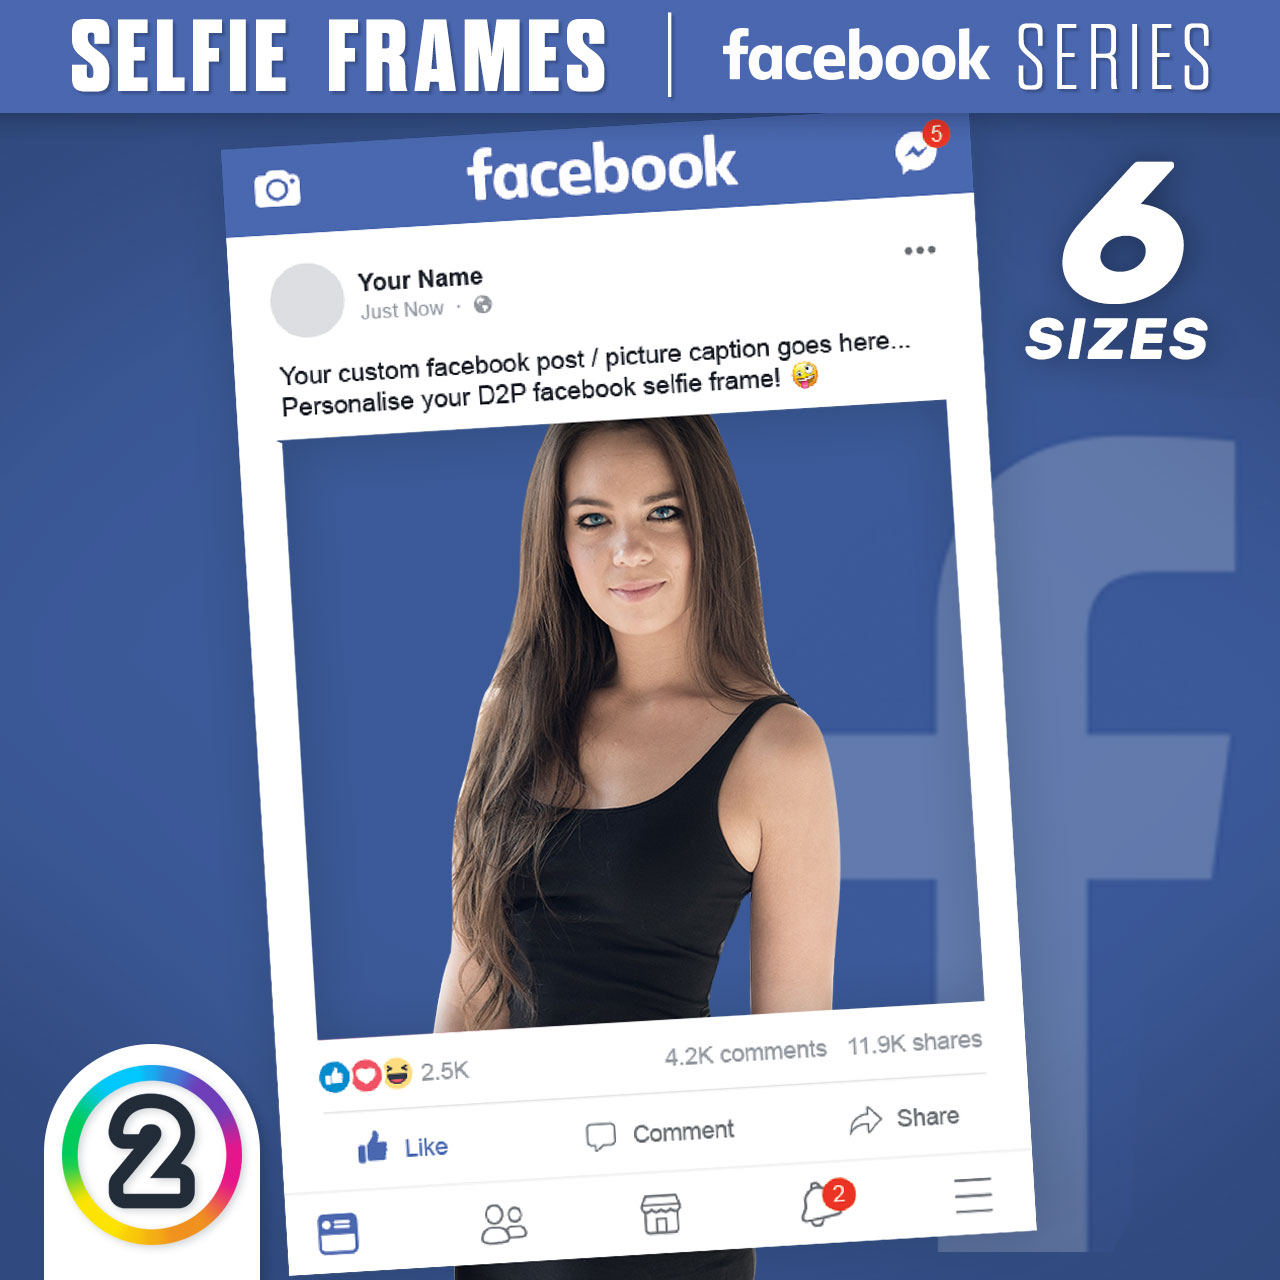 Facebook online dating in Australia